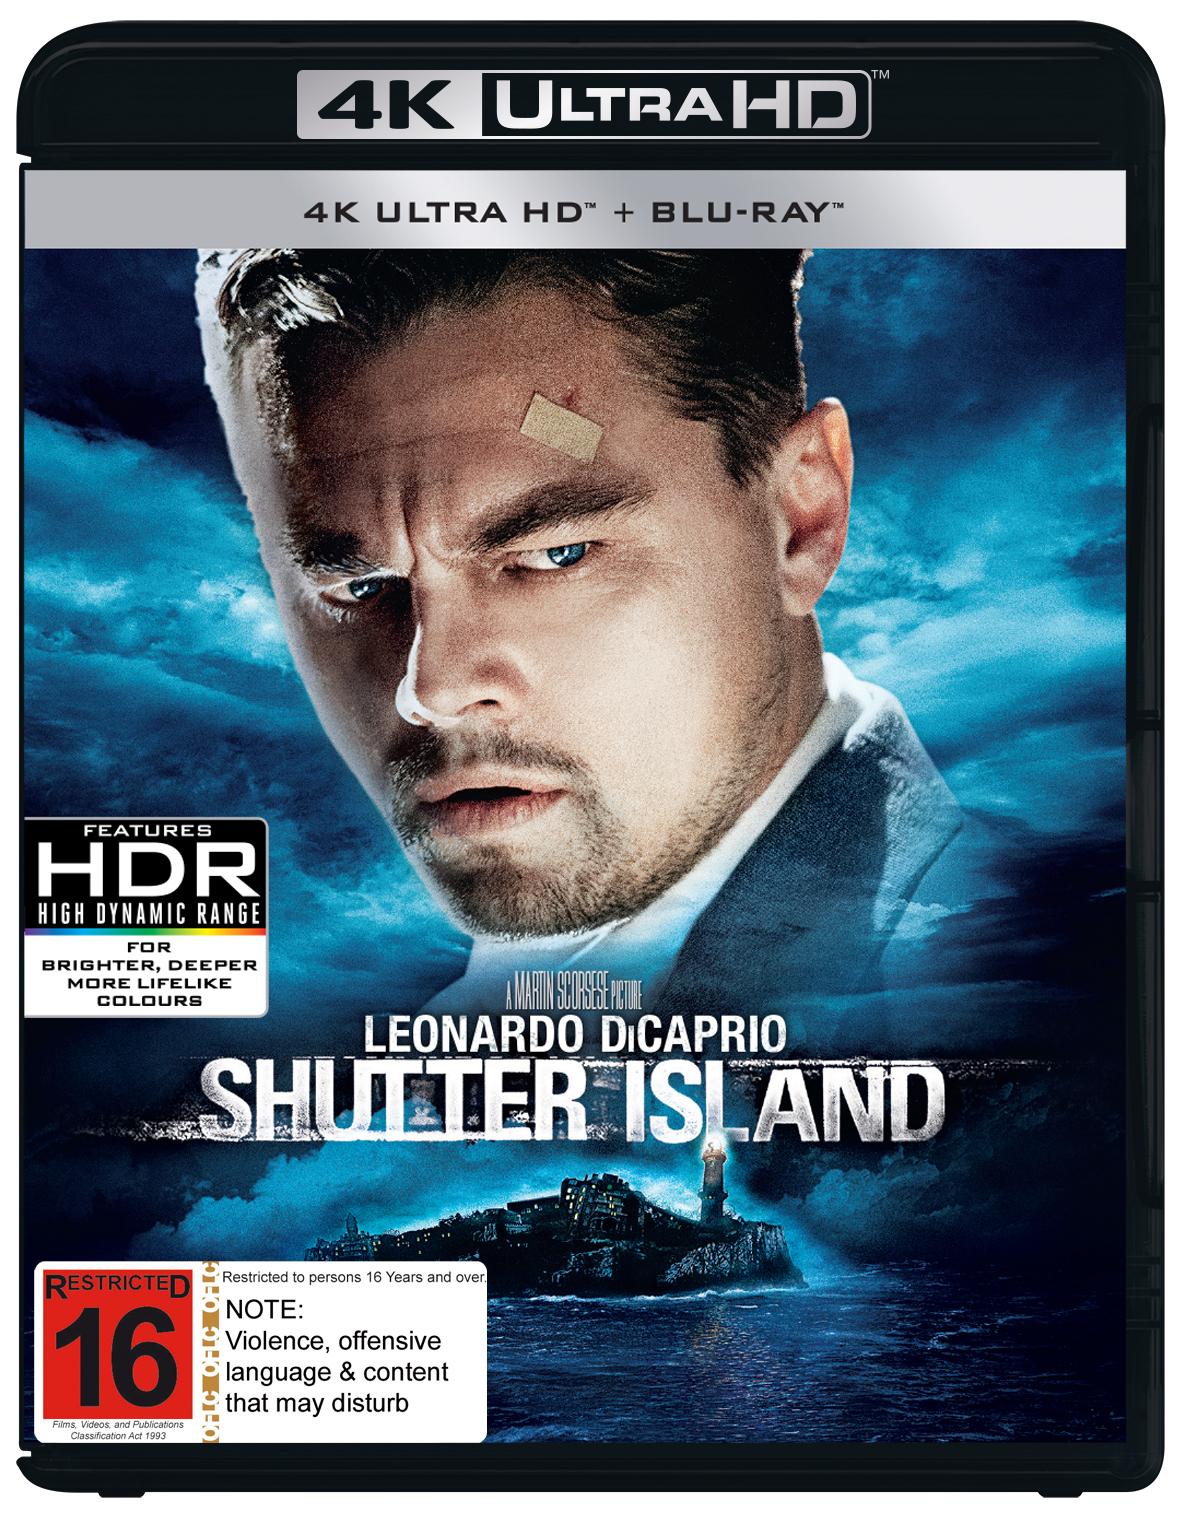 Shutter Island on UHD Blu-ray image